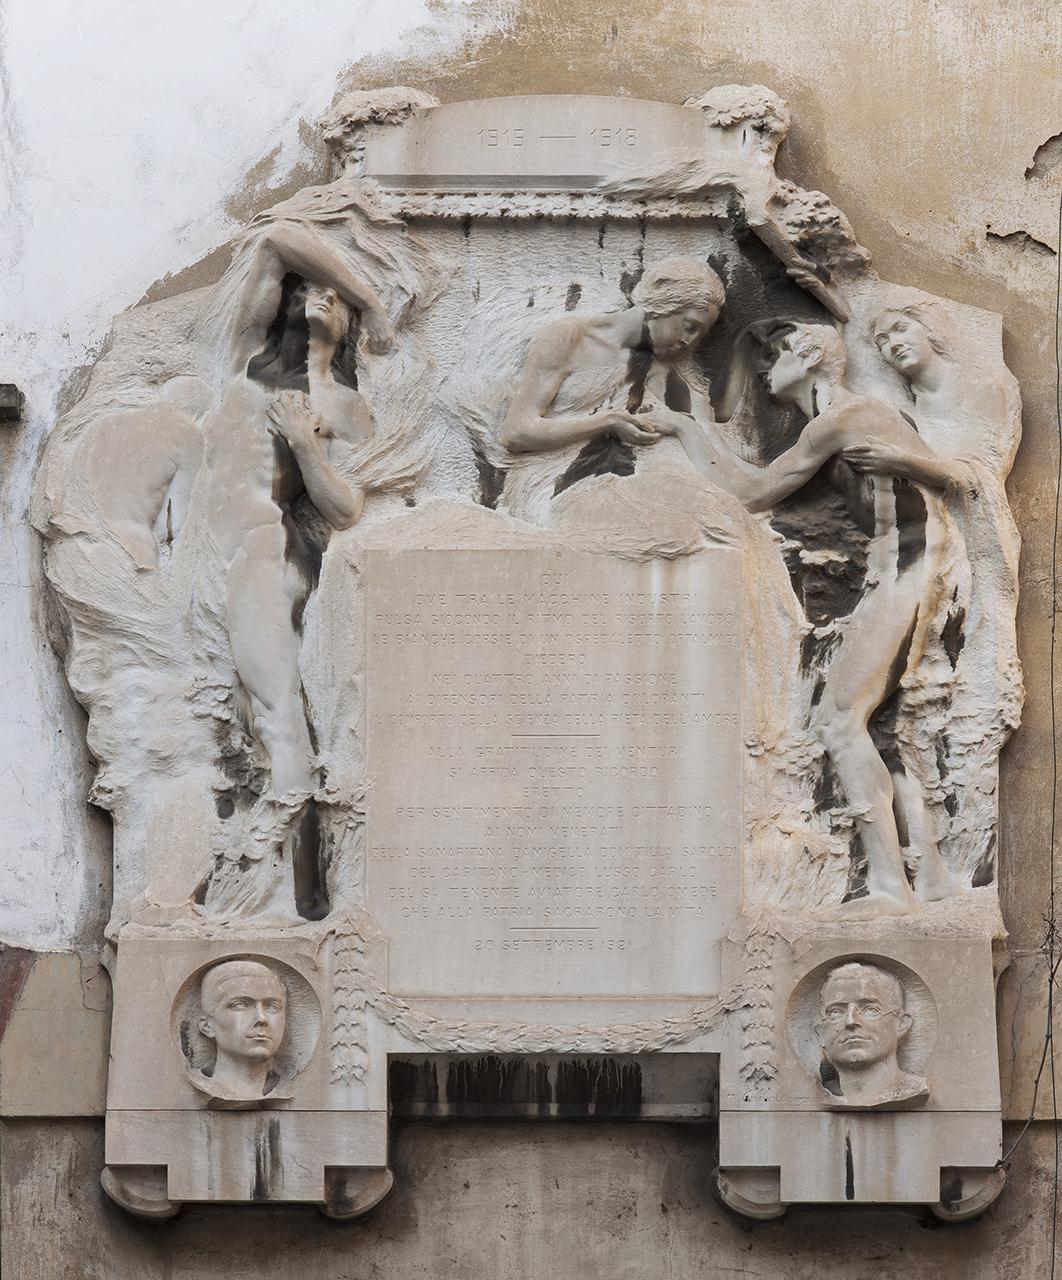 Materno-Giribaldi-monumento-liberty.jpg